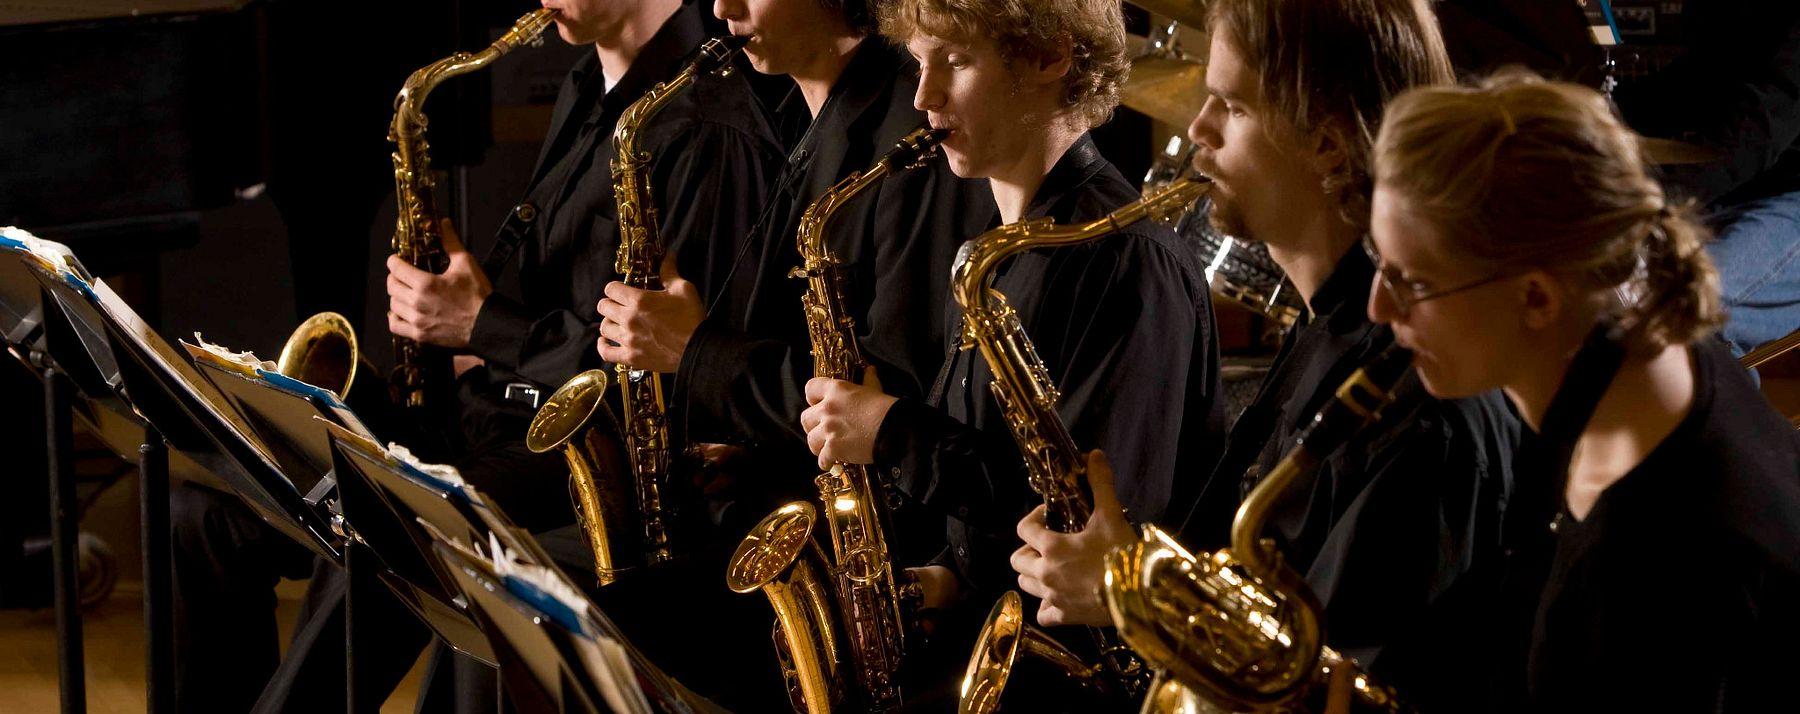 5 saxophonists